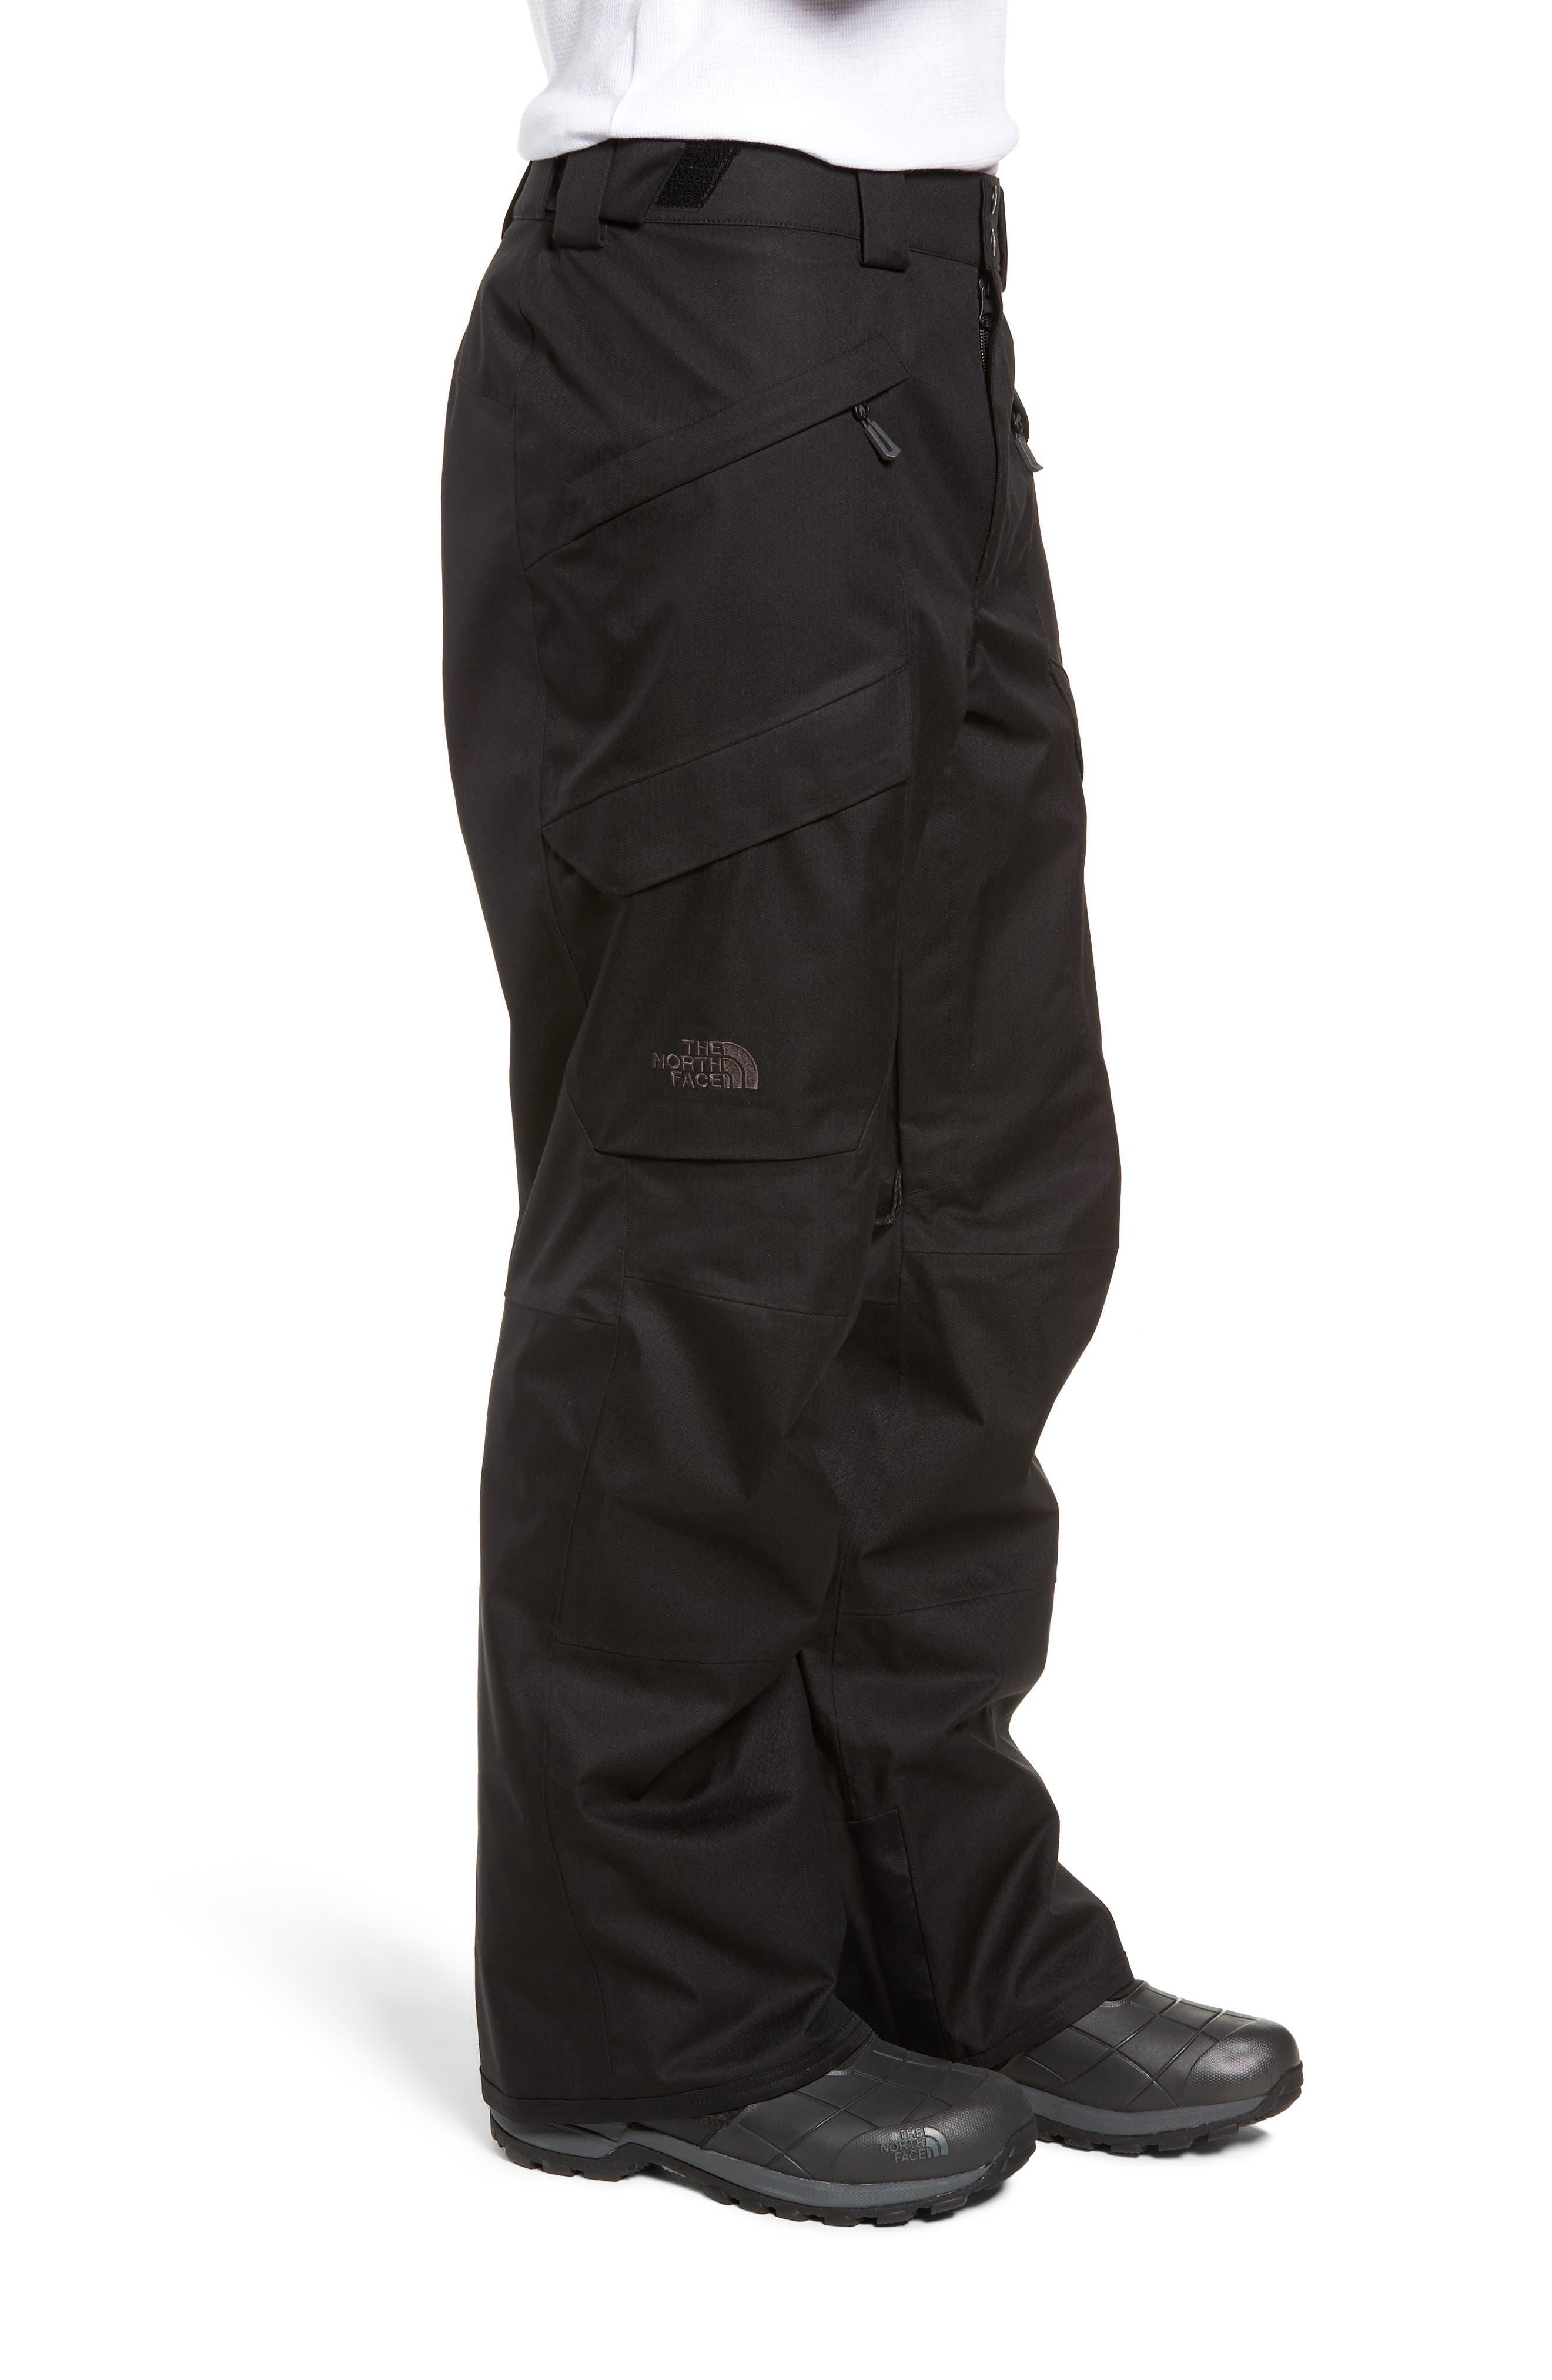 Gatekeeper Waterproof Pants,                             Alternate thumbnail 3, color,                             TNF BLACK/TNF BLACK